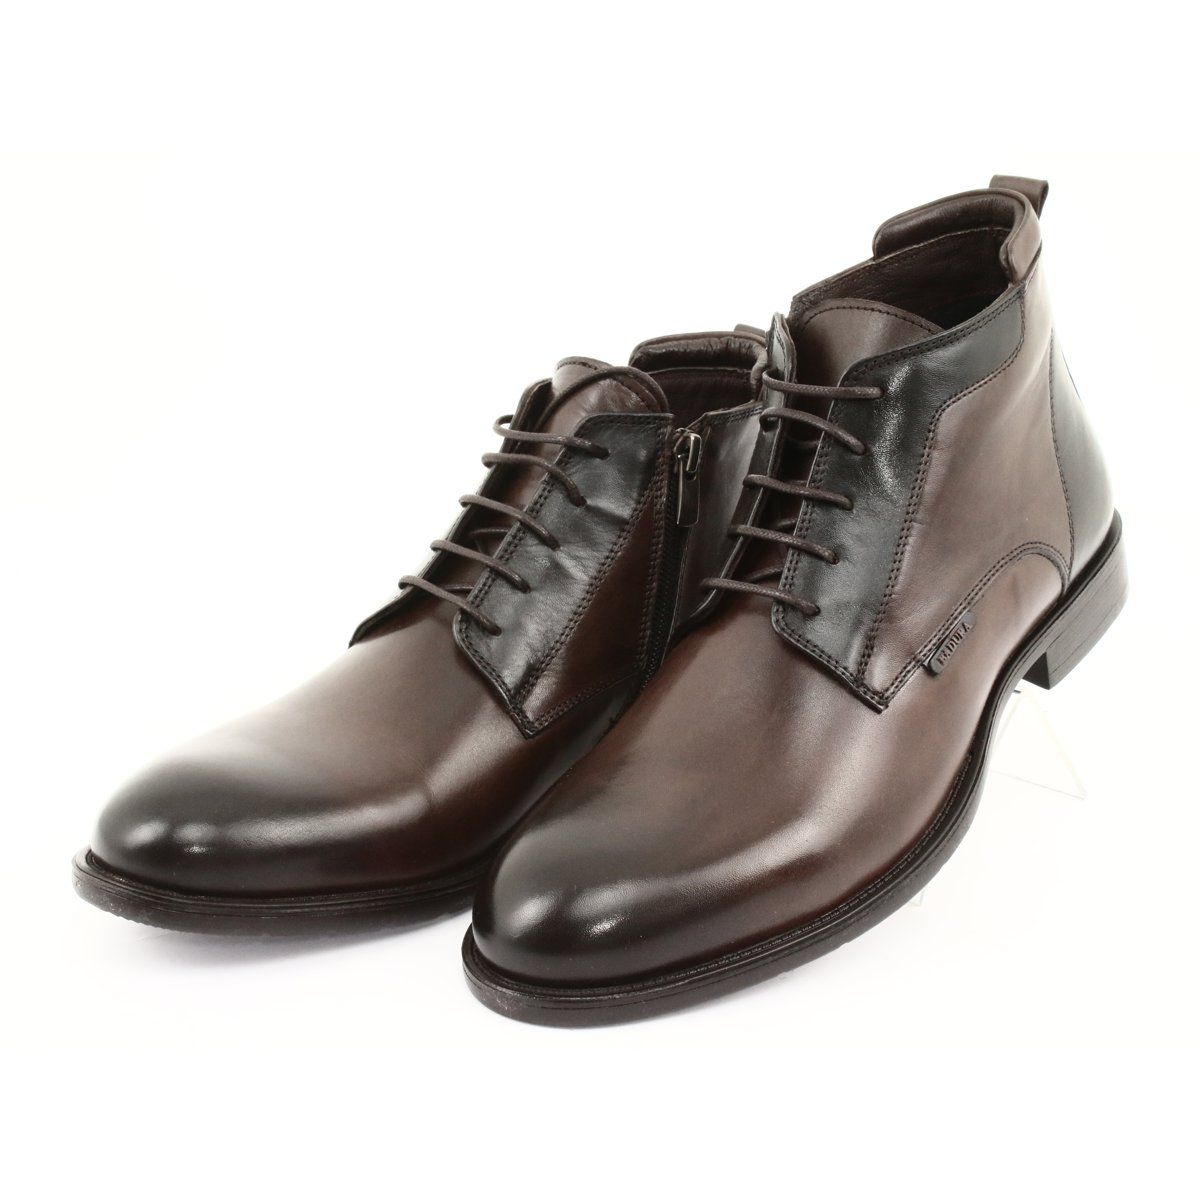 Botki Sztyblety Zimowe Badura Brazowe Chelsea Boots Men Winter Boots Dress Shoes Men